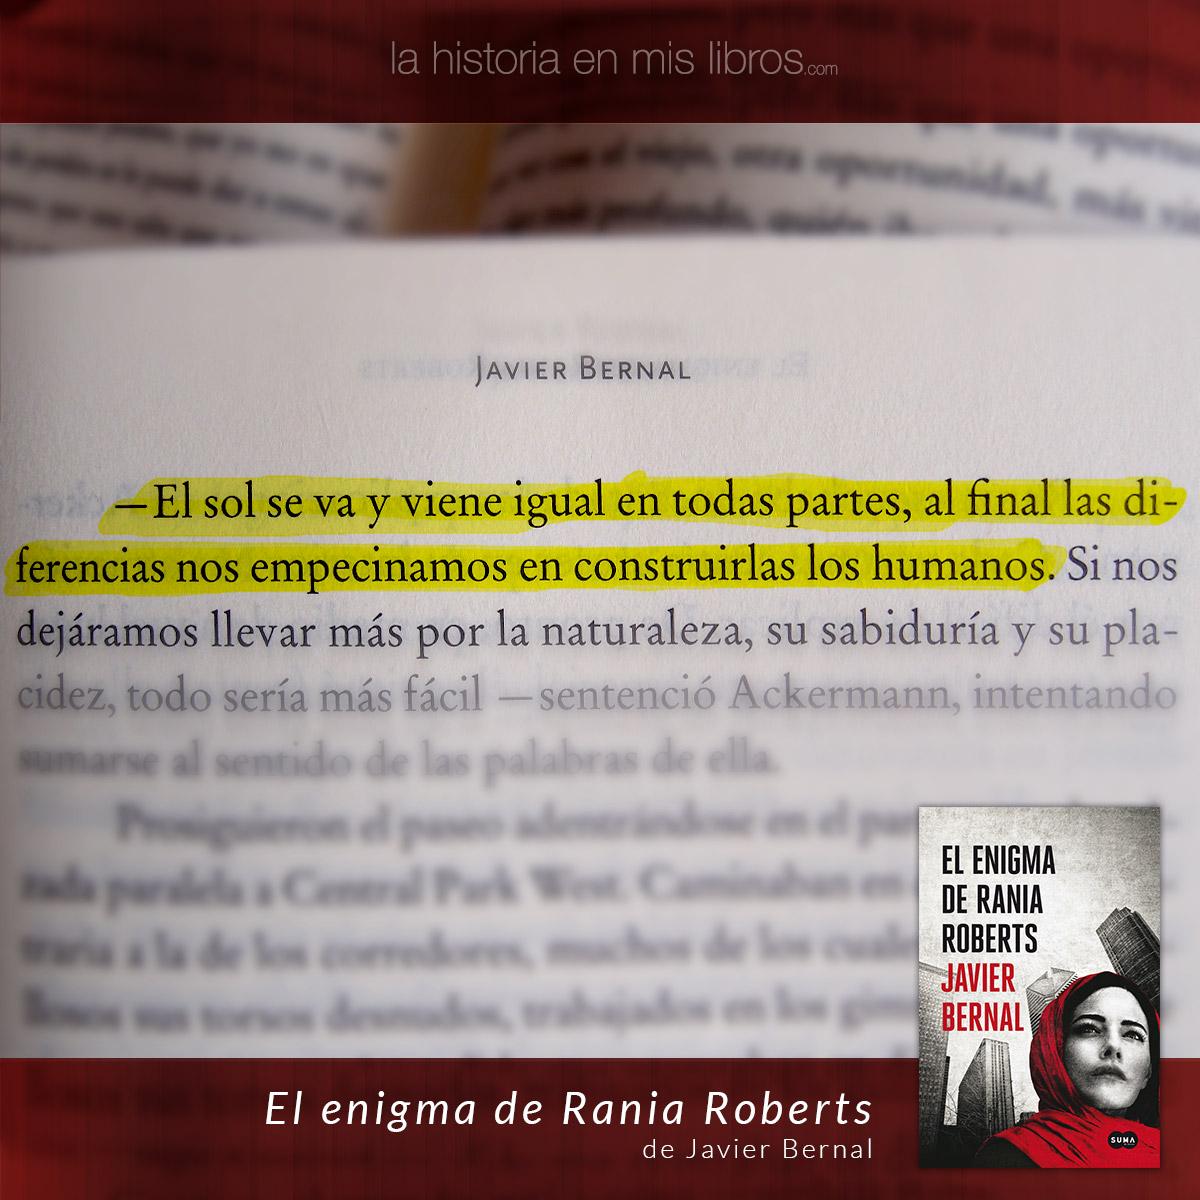 El enigma de Rania Roberts de Javier Bernal